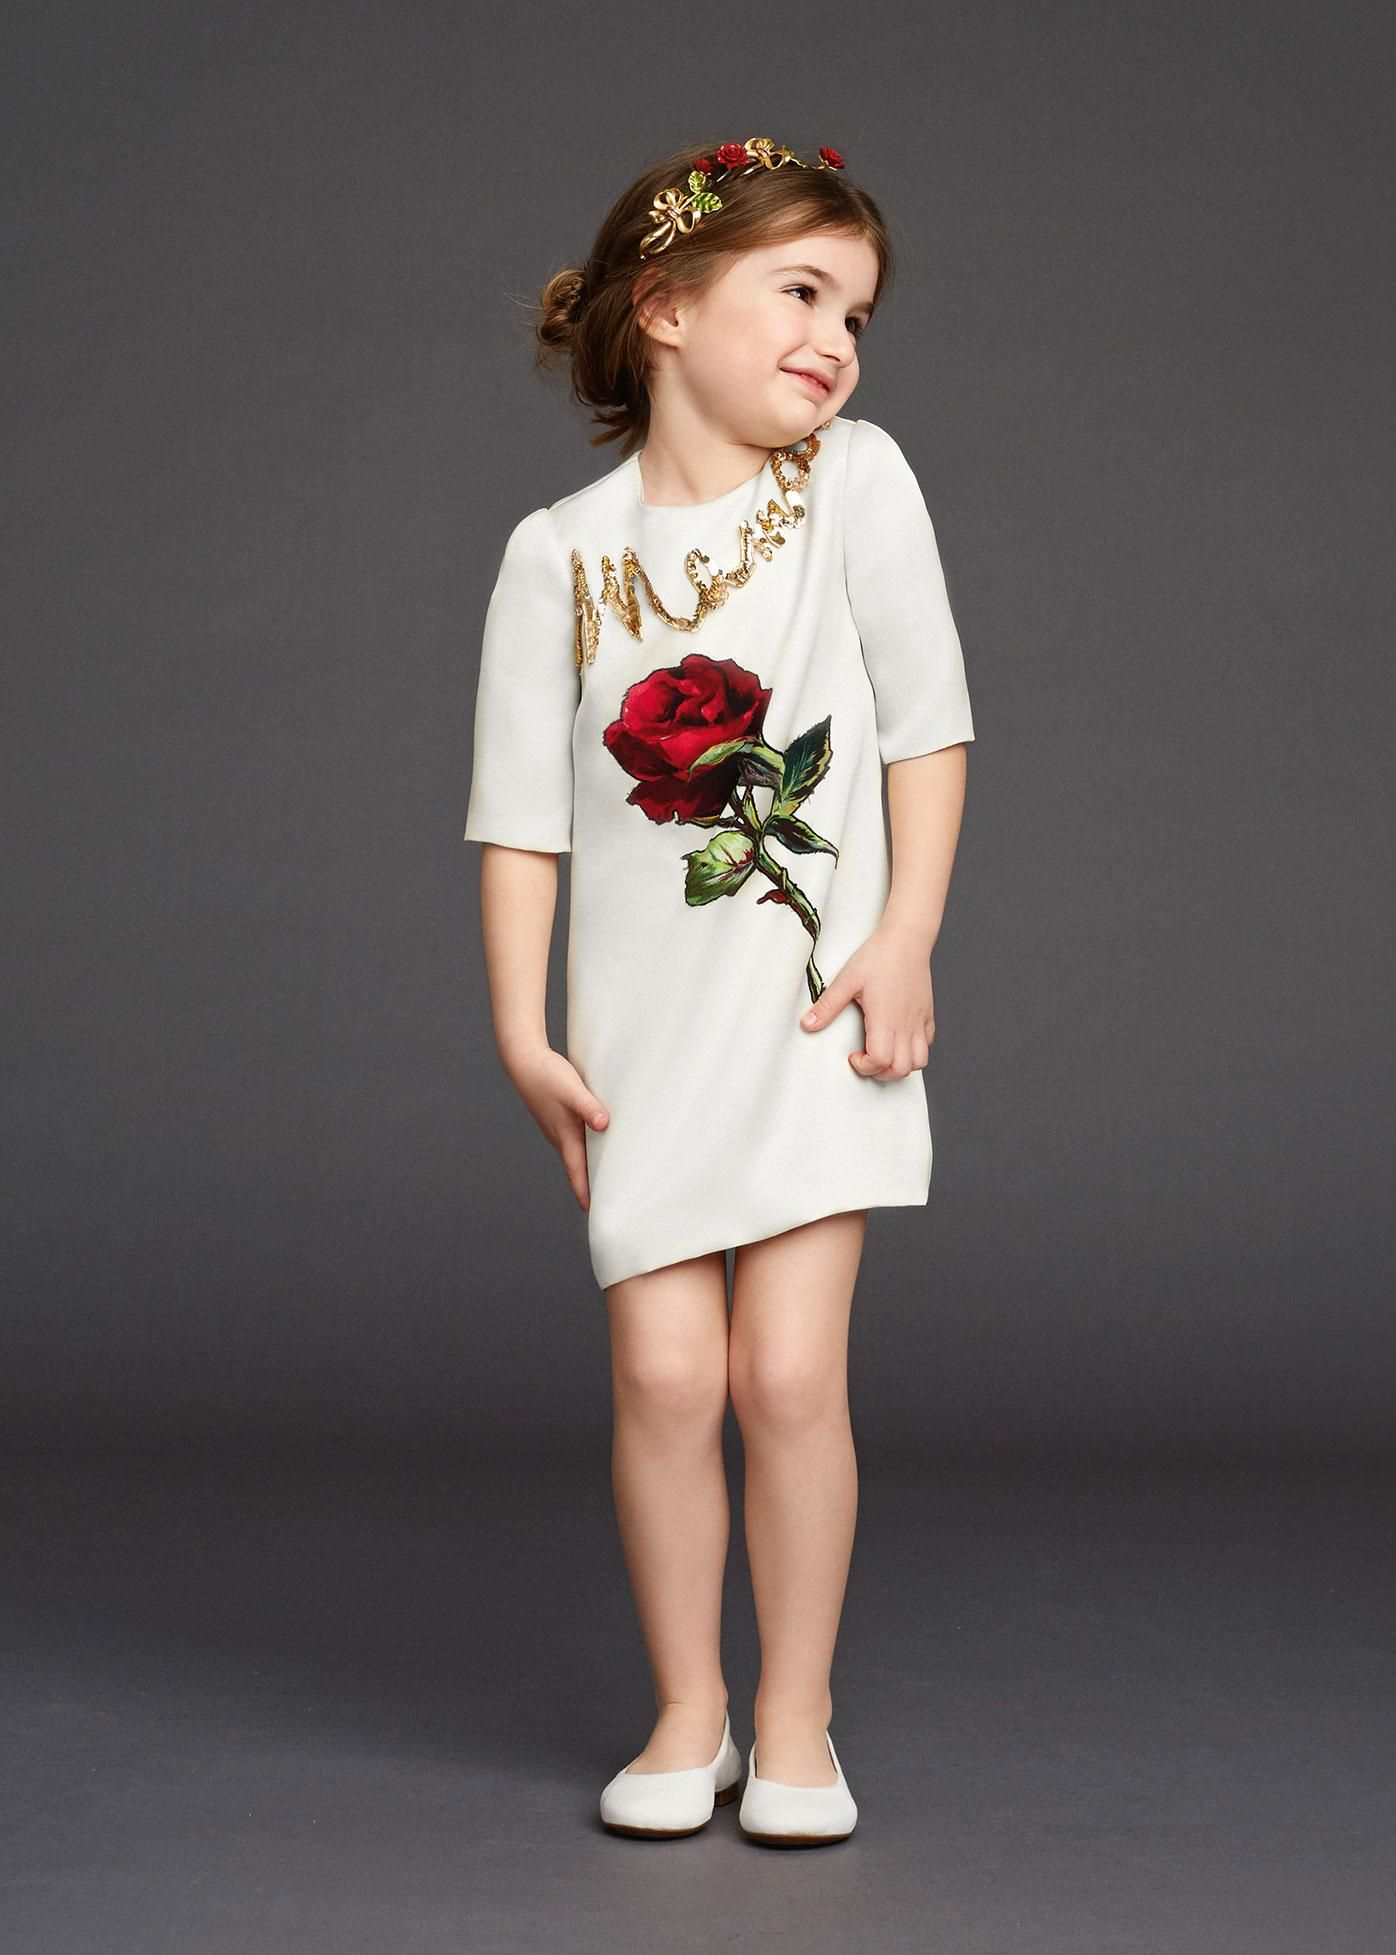 3cbc465d103eb Wl Monsoon Children's Dresses 2015 Autumn Designer Girls Dresses Kids  Clothing Rose Flower Girl Dress Winter Princess Girls Clothes 2-12Y Online  with ...